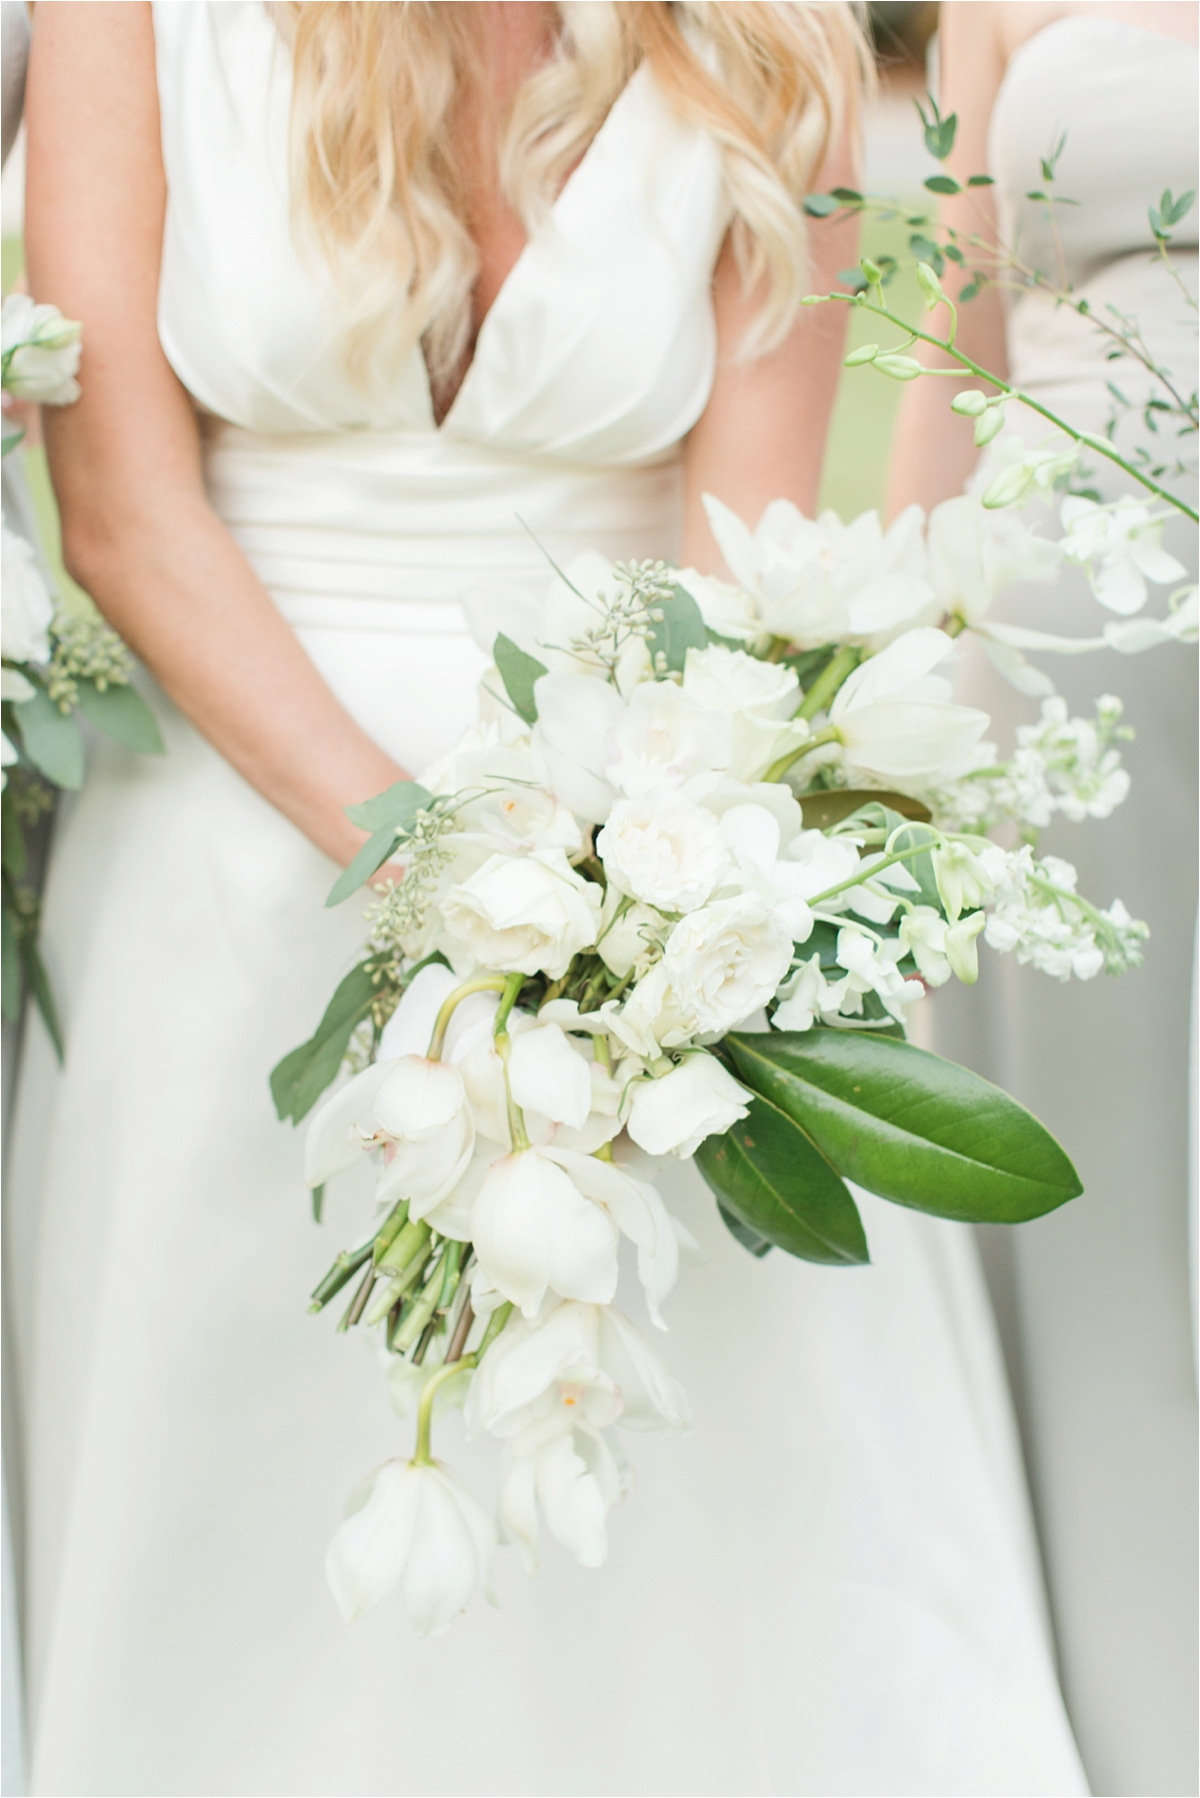 Seaside Florida Wedding Photographer-Catherine Carter + Brian-Alabama photographer-Neutral Wedding-Flower bouquets